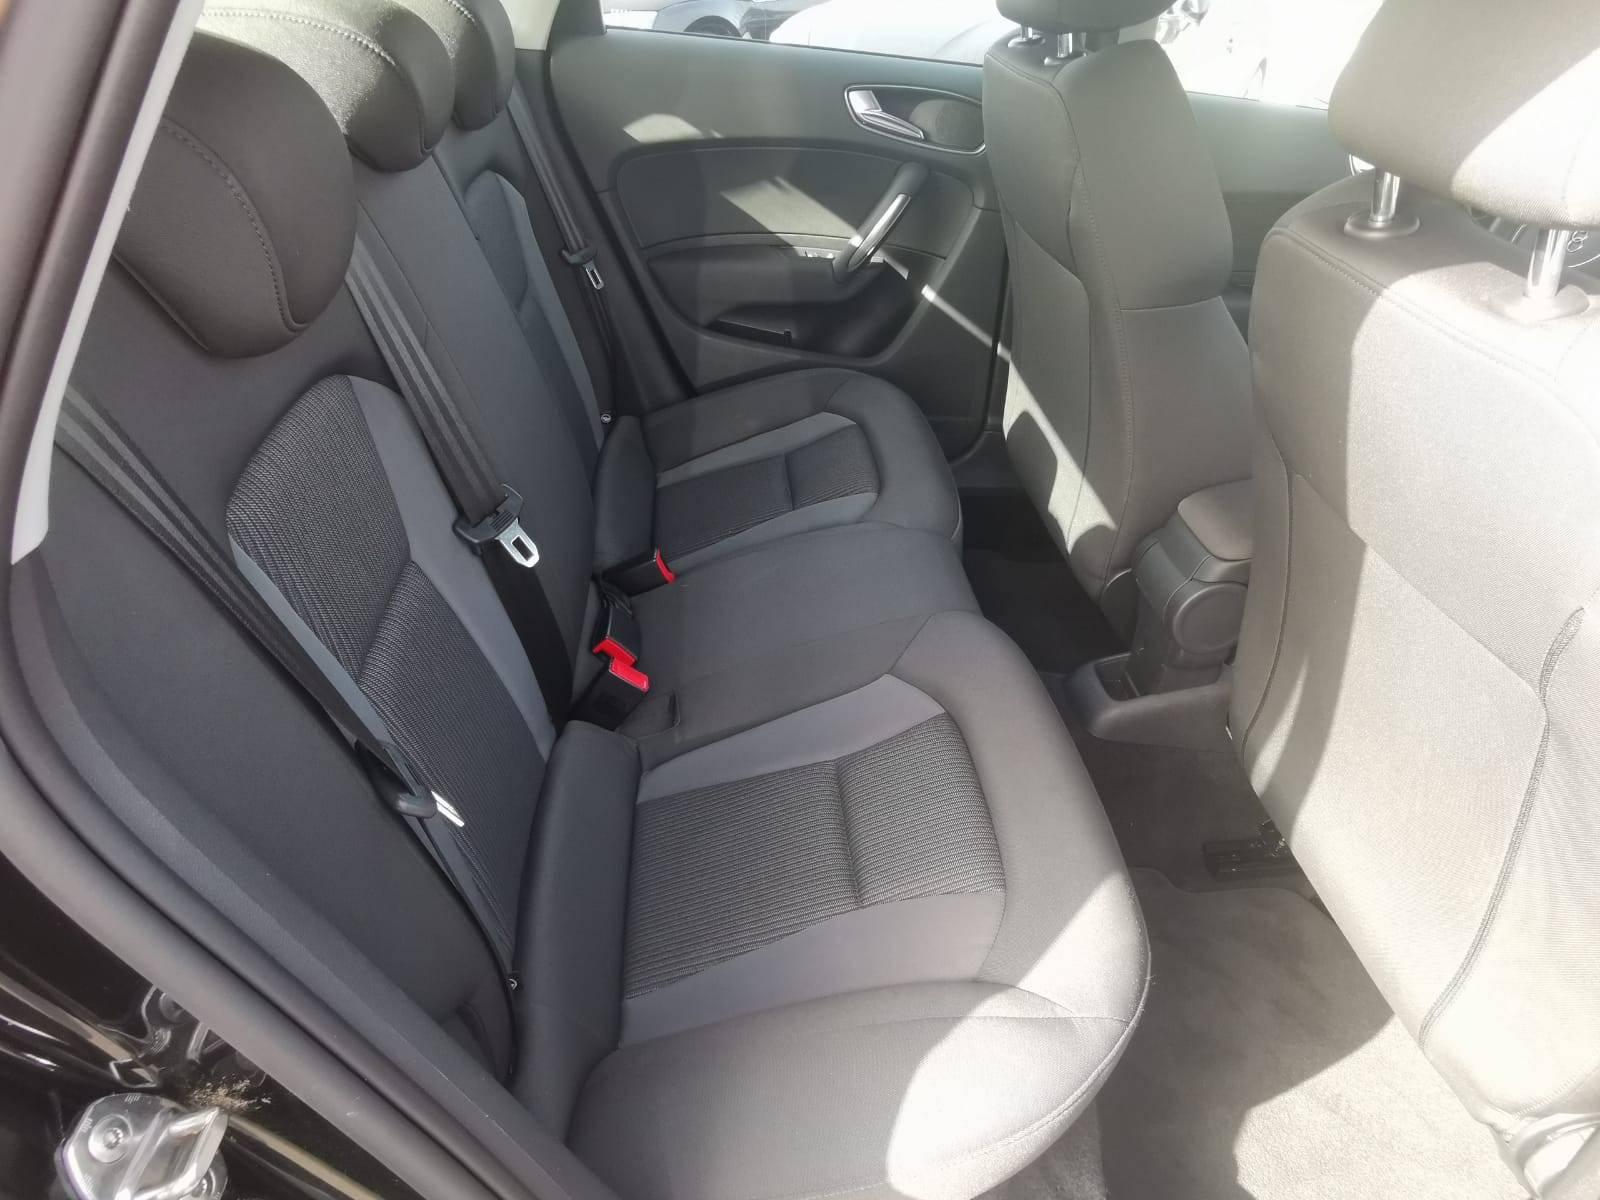 7 - A1 Sportback 1.4 TFSI 125